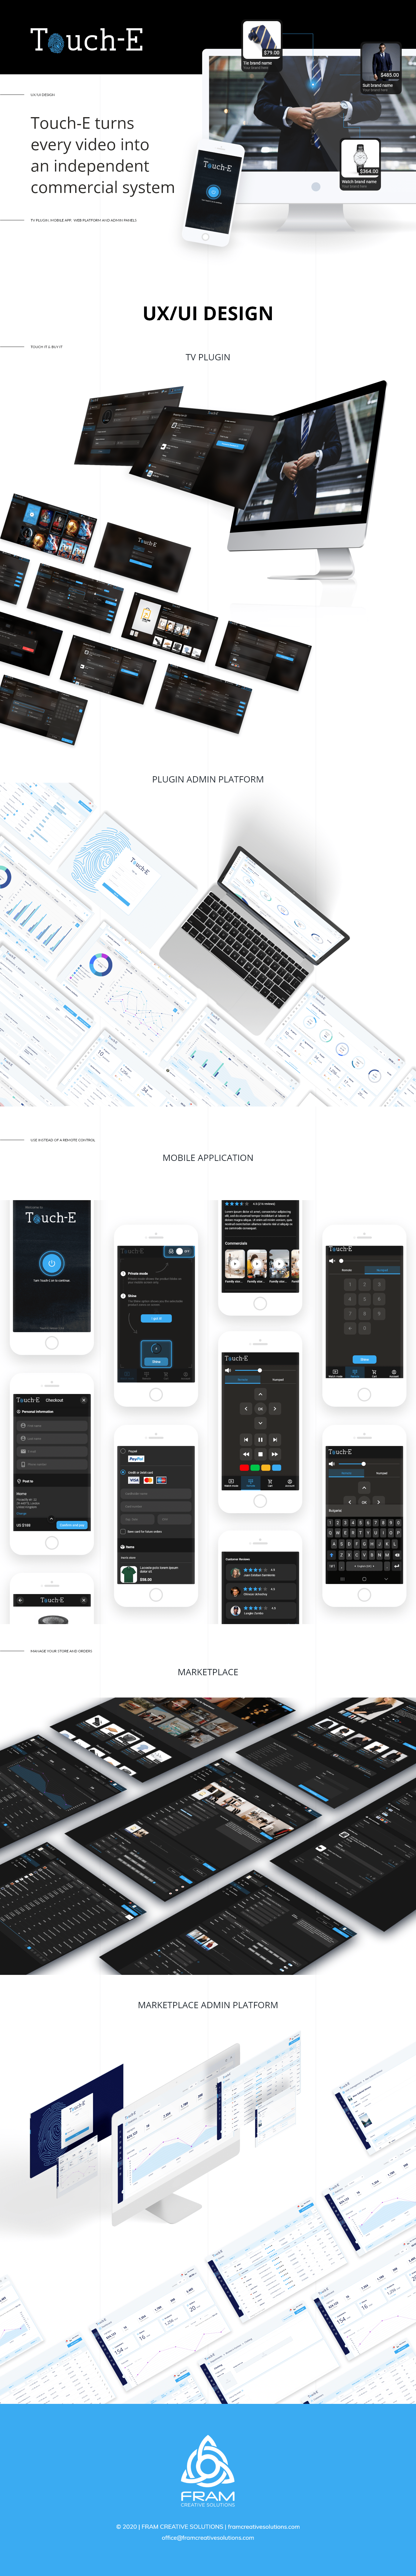 application e-commerce UI ux ux/ui webdeisgn Webplatform